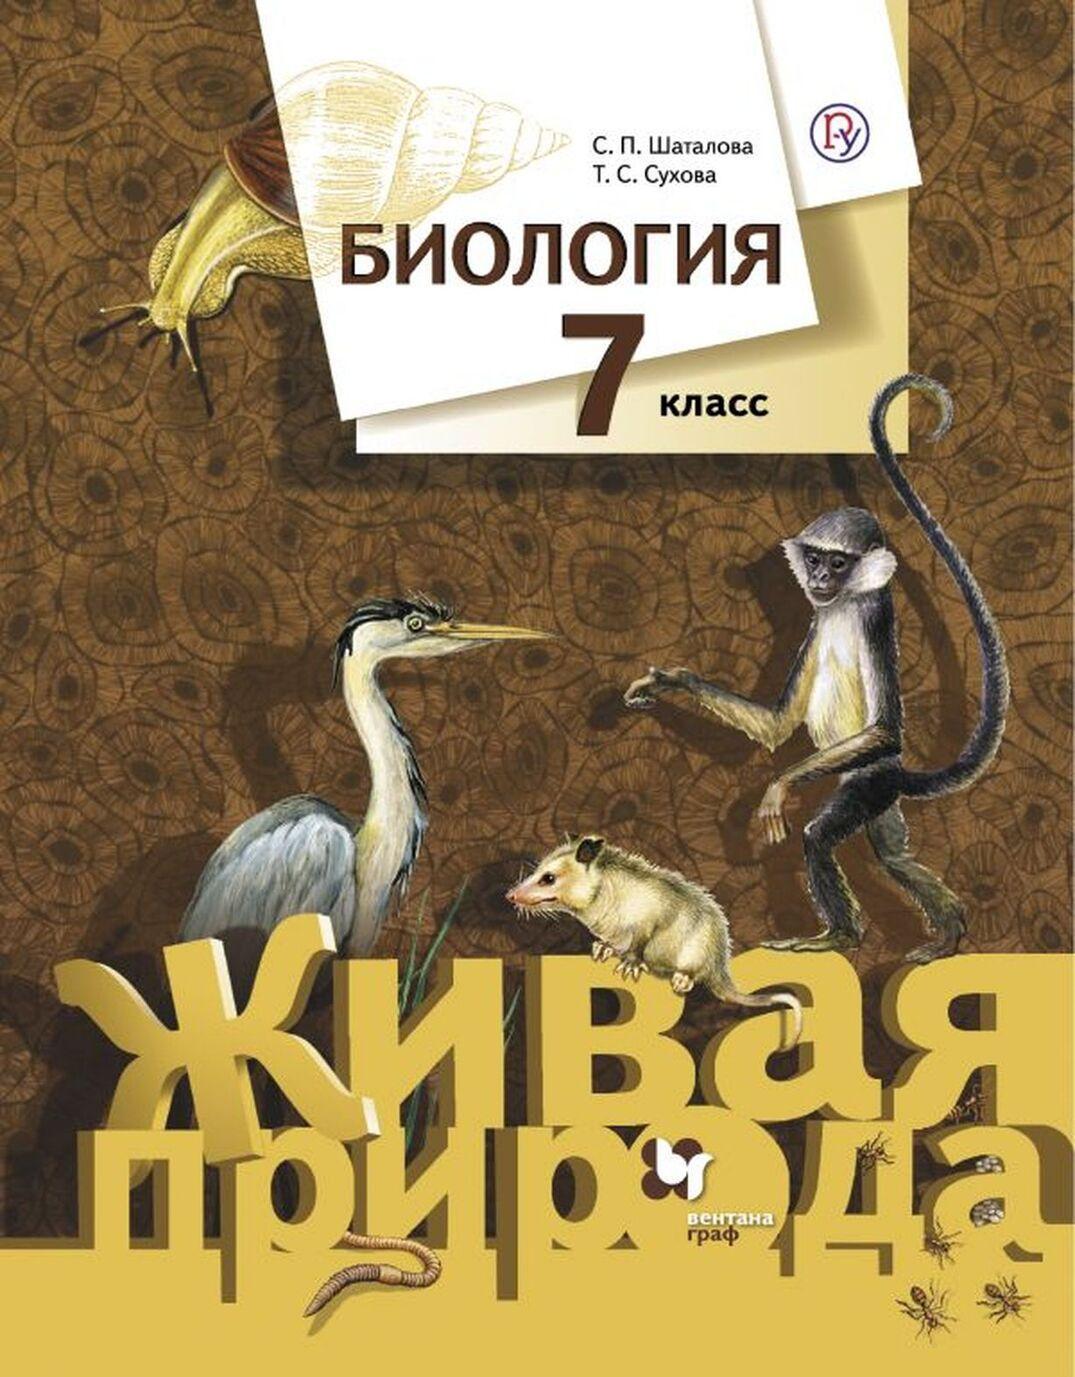 Biologija. 7klass. Uchebnik | Shatalova Svetlana Petrovna, Sukhova Tamara Sergeevna